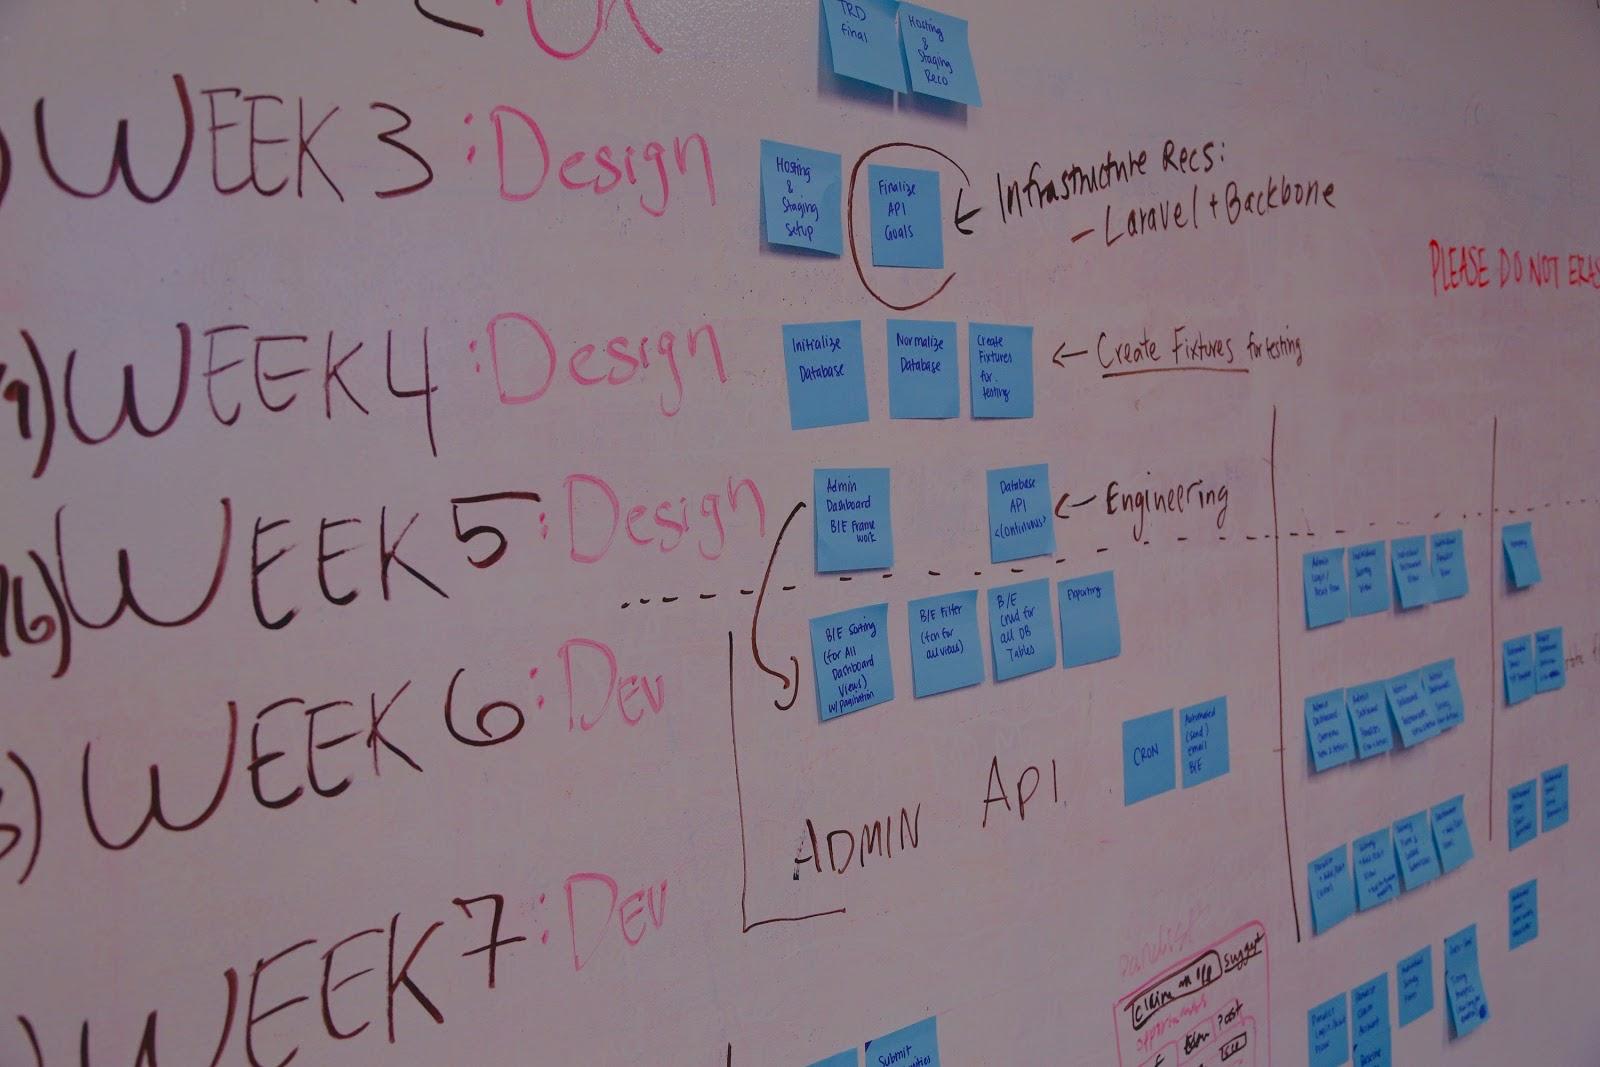 agenda-concept-development-7376-1